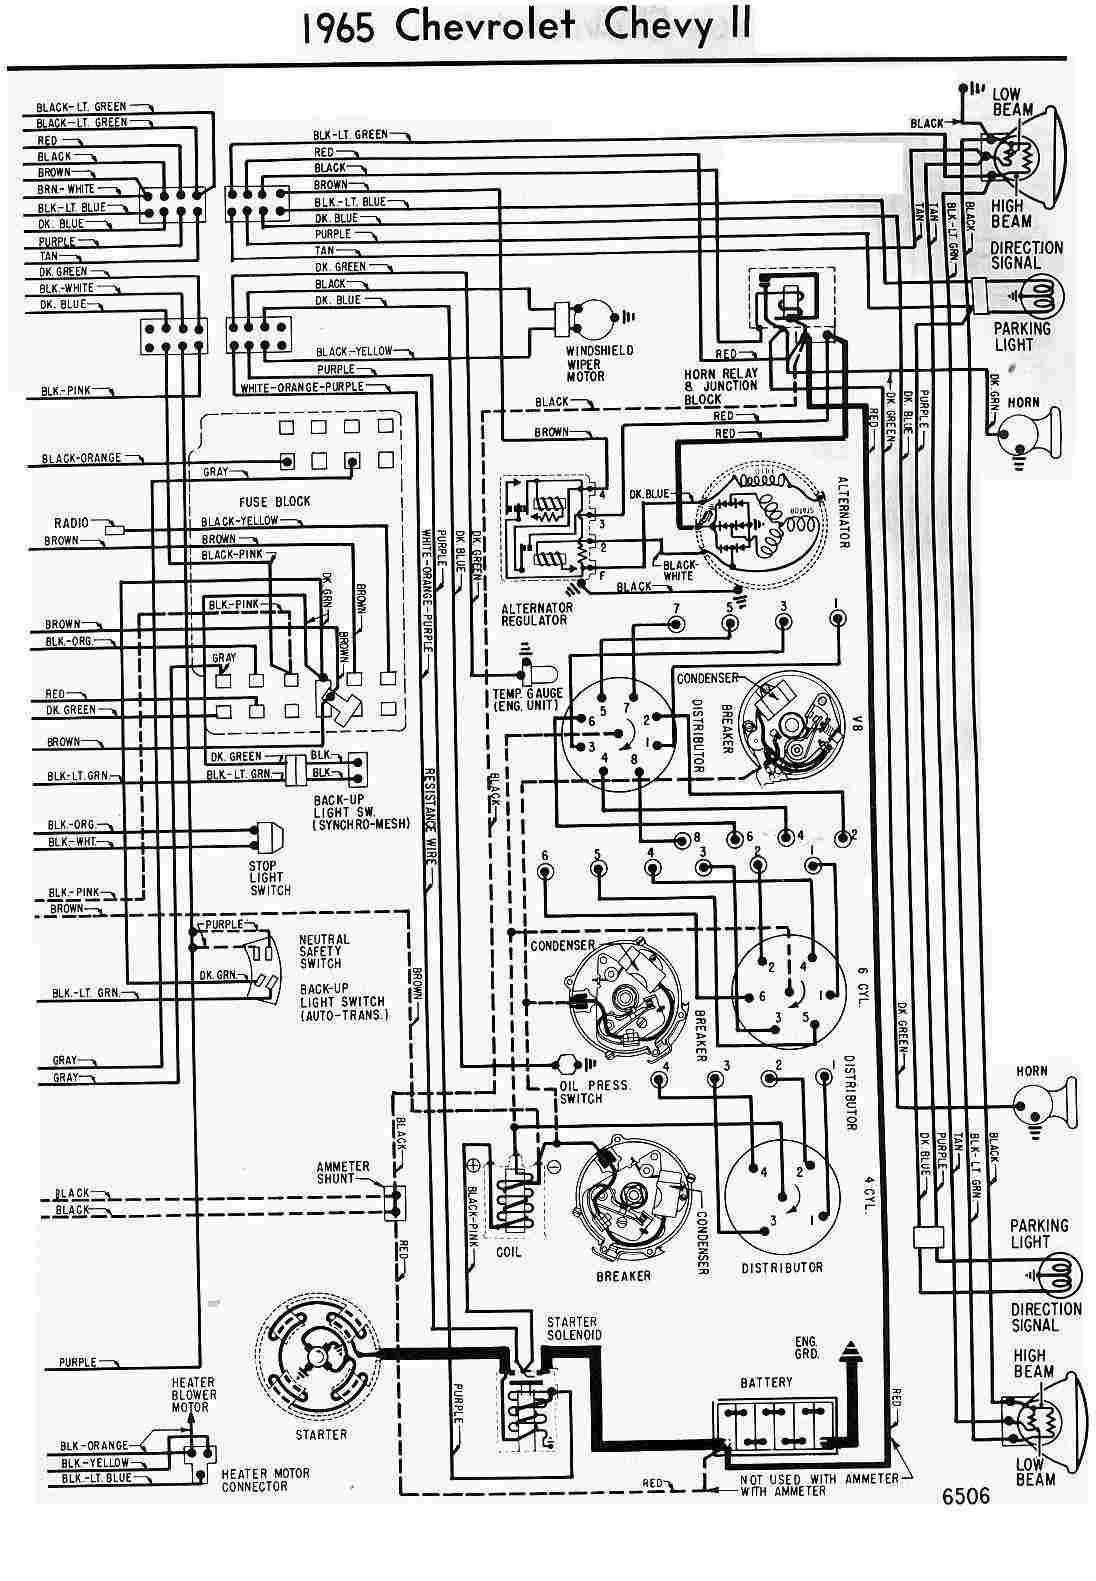 1976 corvette dash wiring diagram schematic simple wiring diagramswiring diagram 1964 chevy corvette wiring diagrams 1977 [ 1096 x 1581 Pixel ]